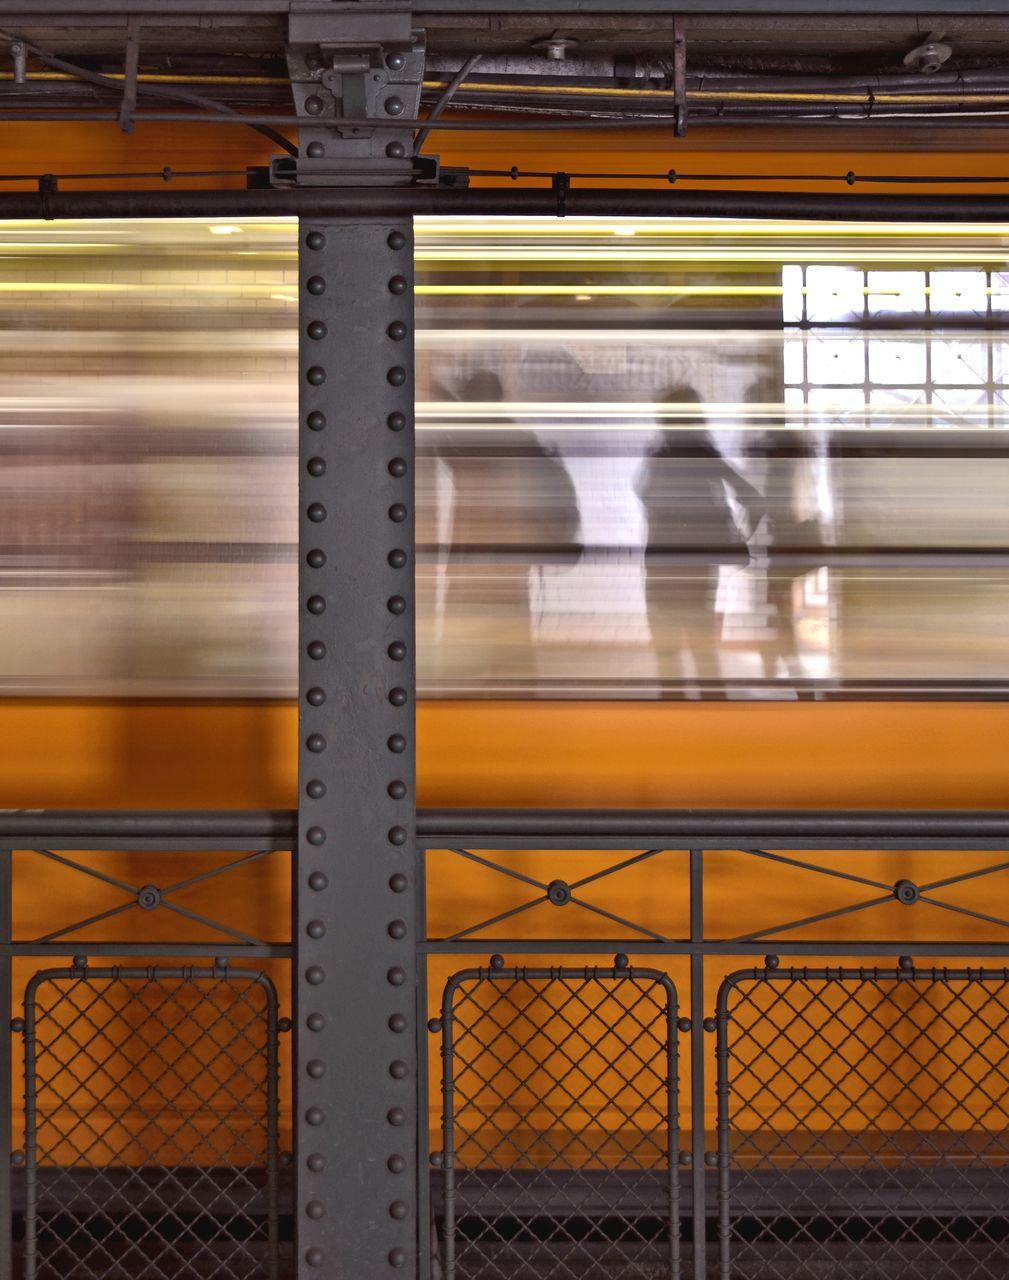 TRAIN AT SUBWAY STATION PLATFORM